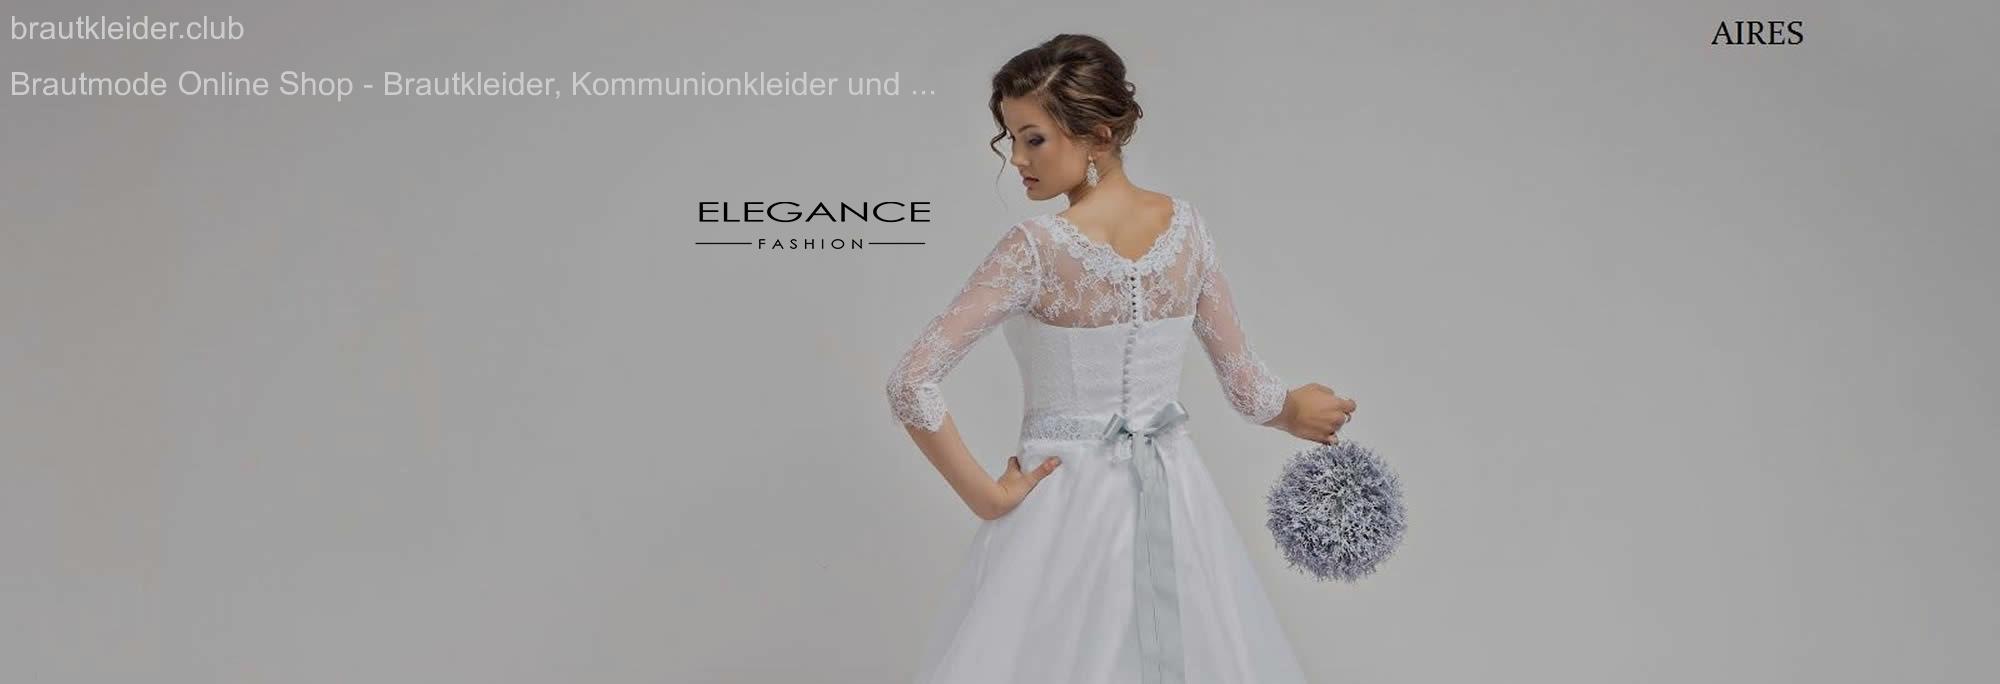 20 Cool Brautmode Shop Stylish13 Einfach Brautmode Shop Vertrieb